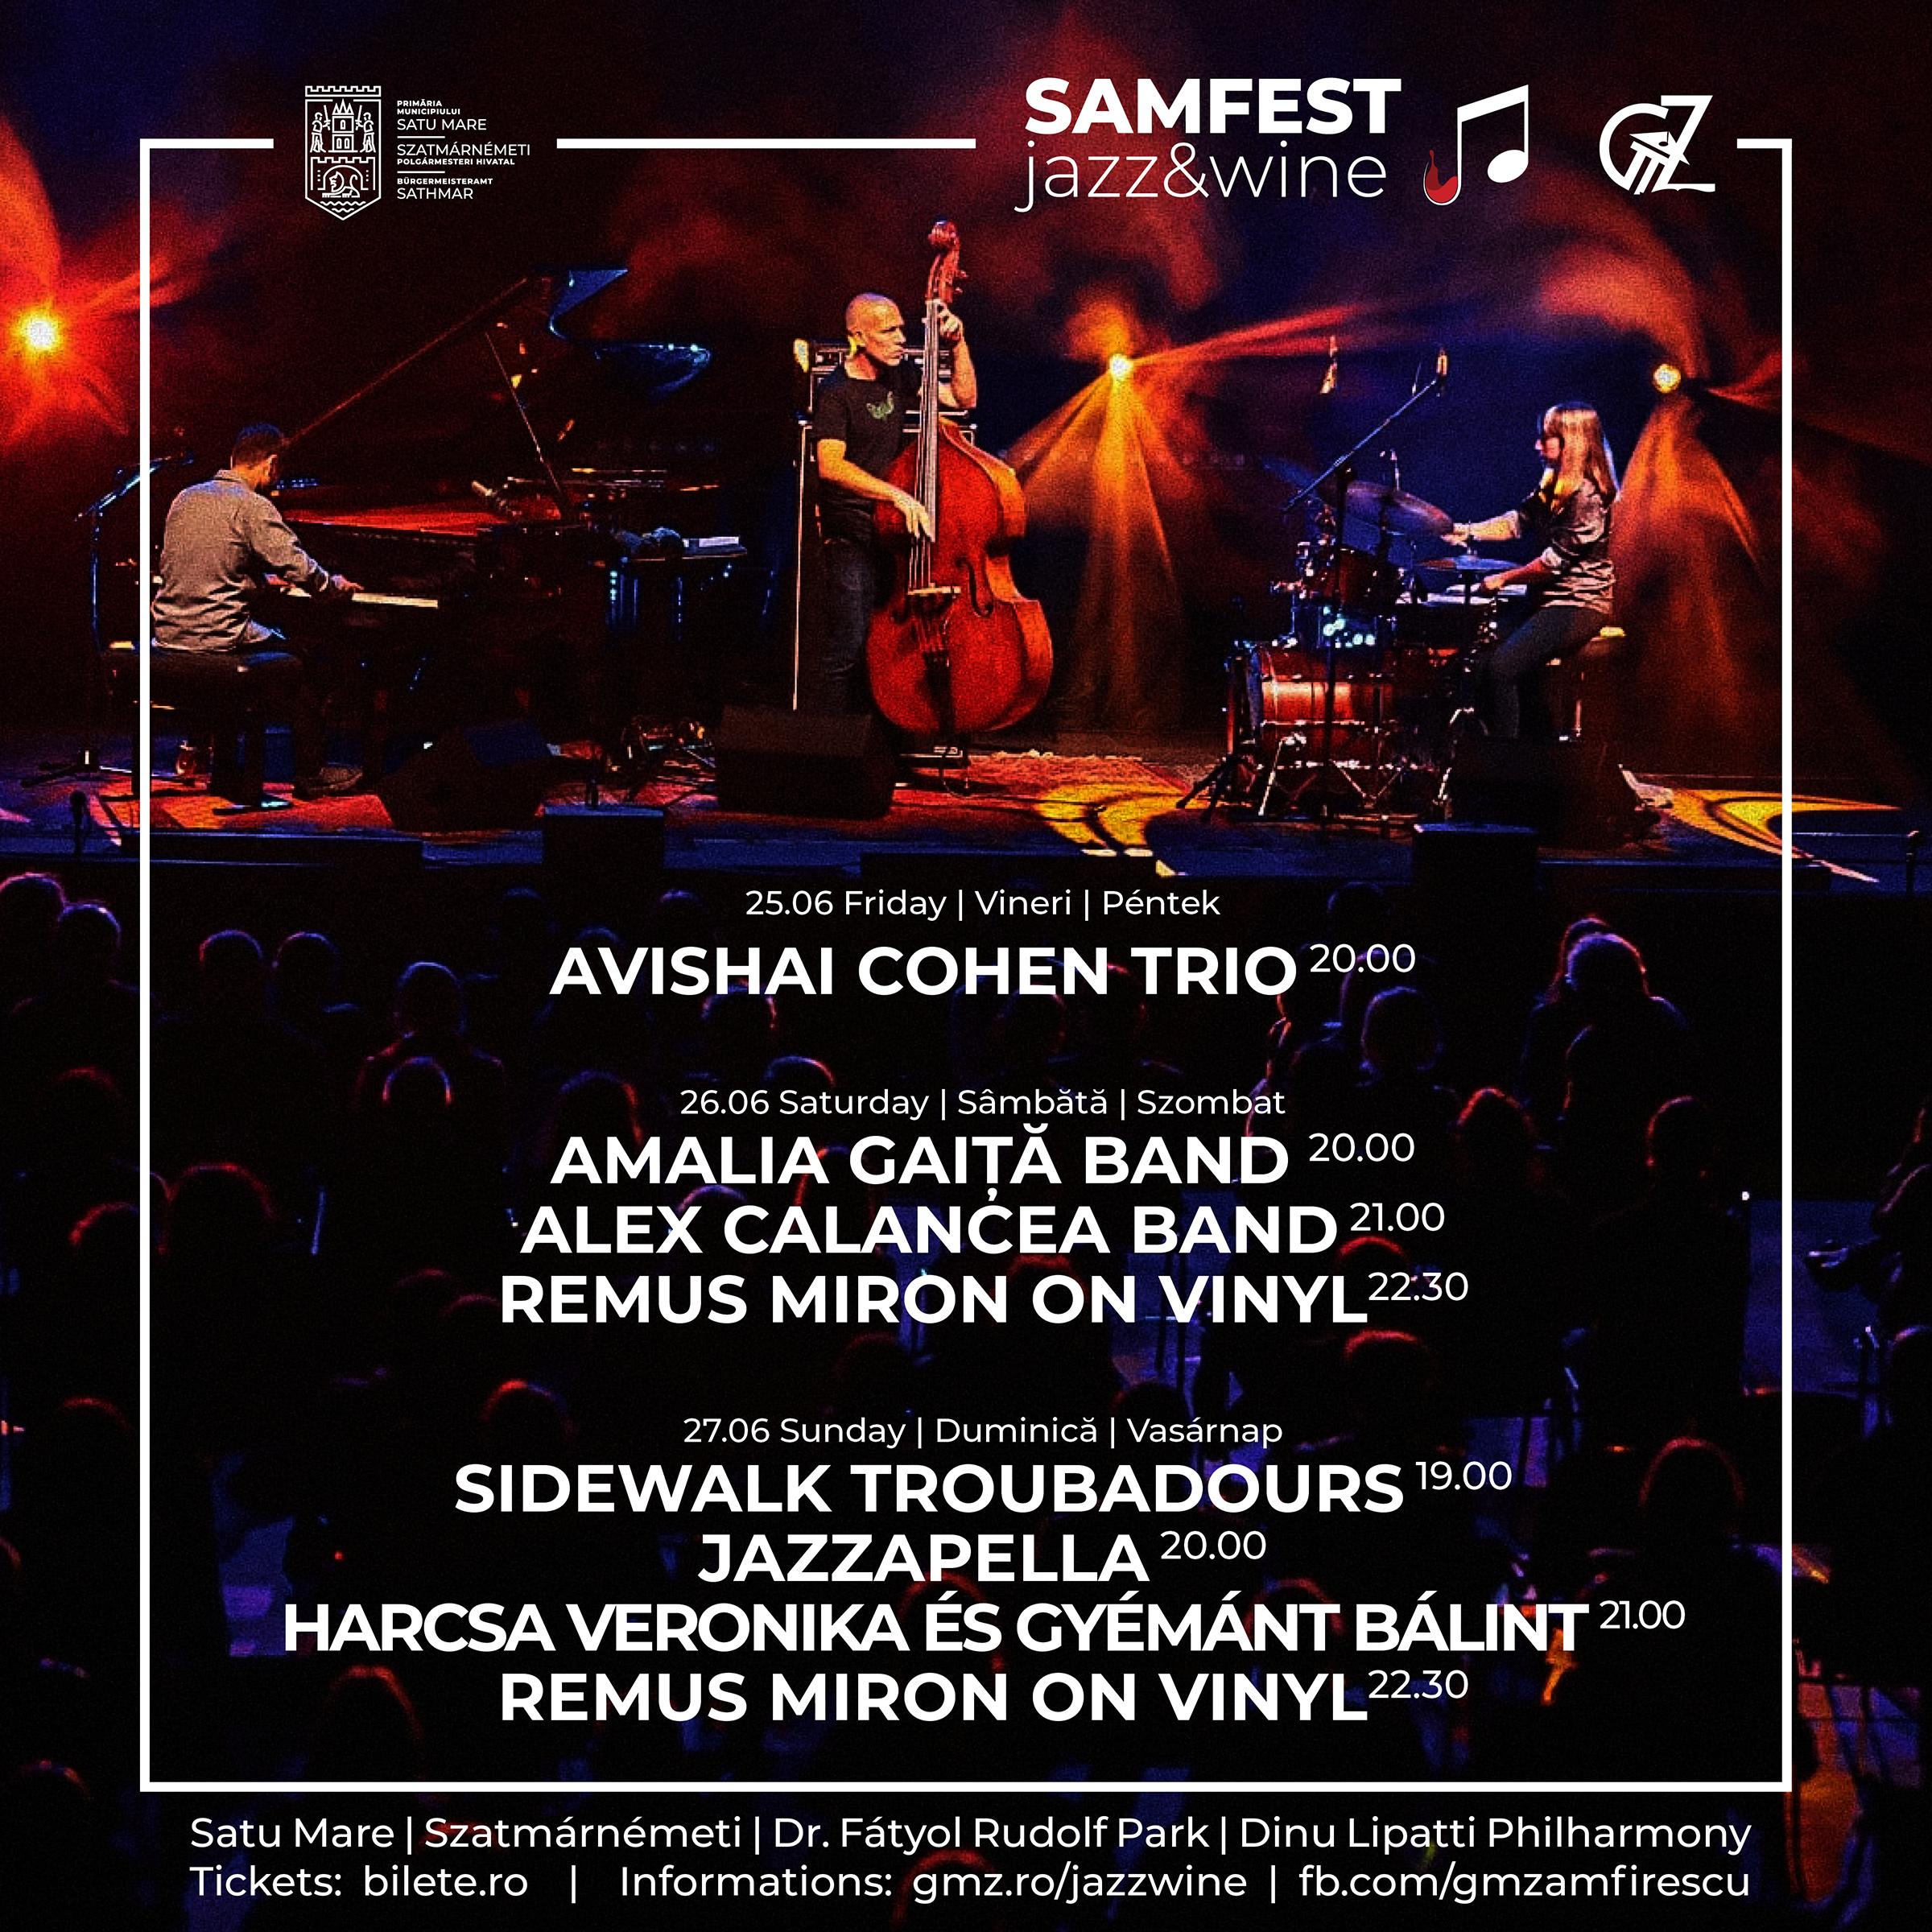 evenimente/samfest/samfest-jazzwine2.jpg